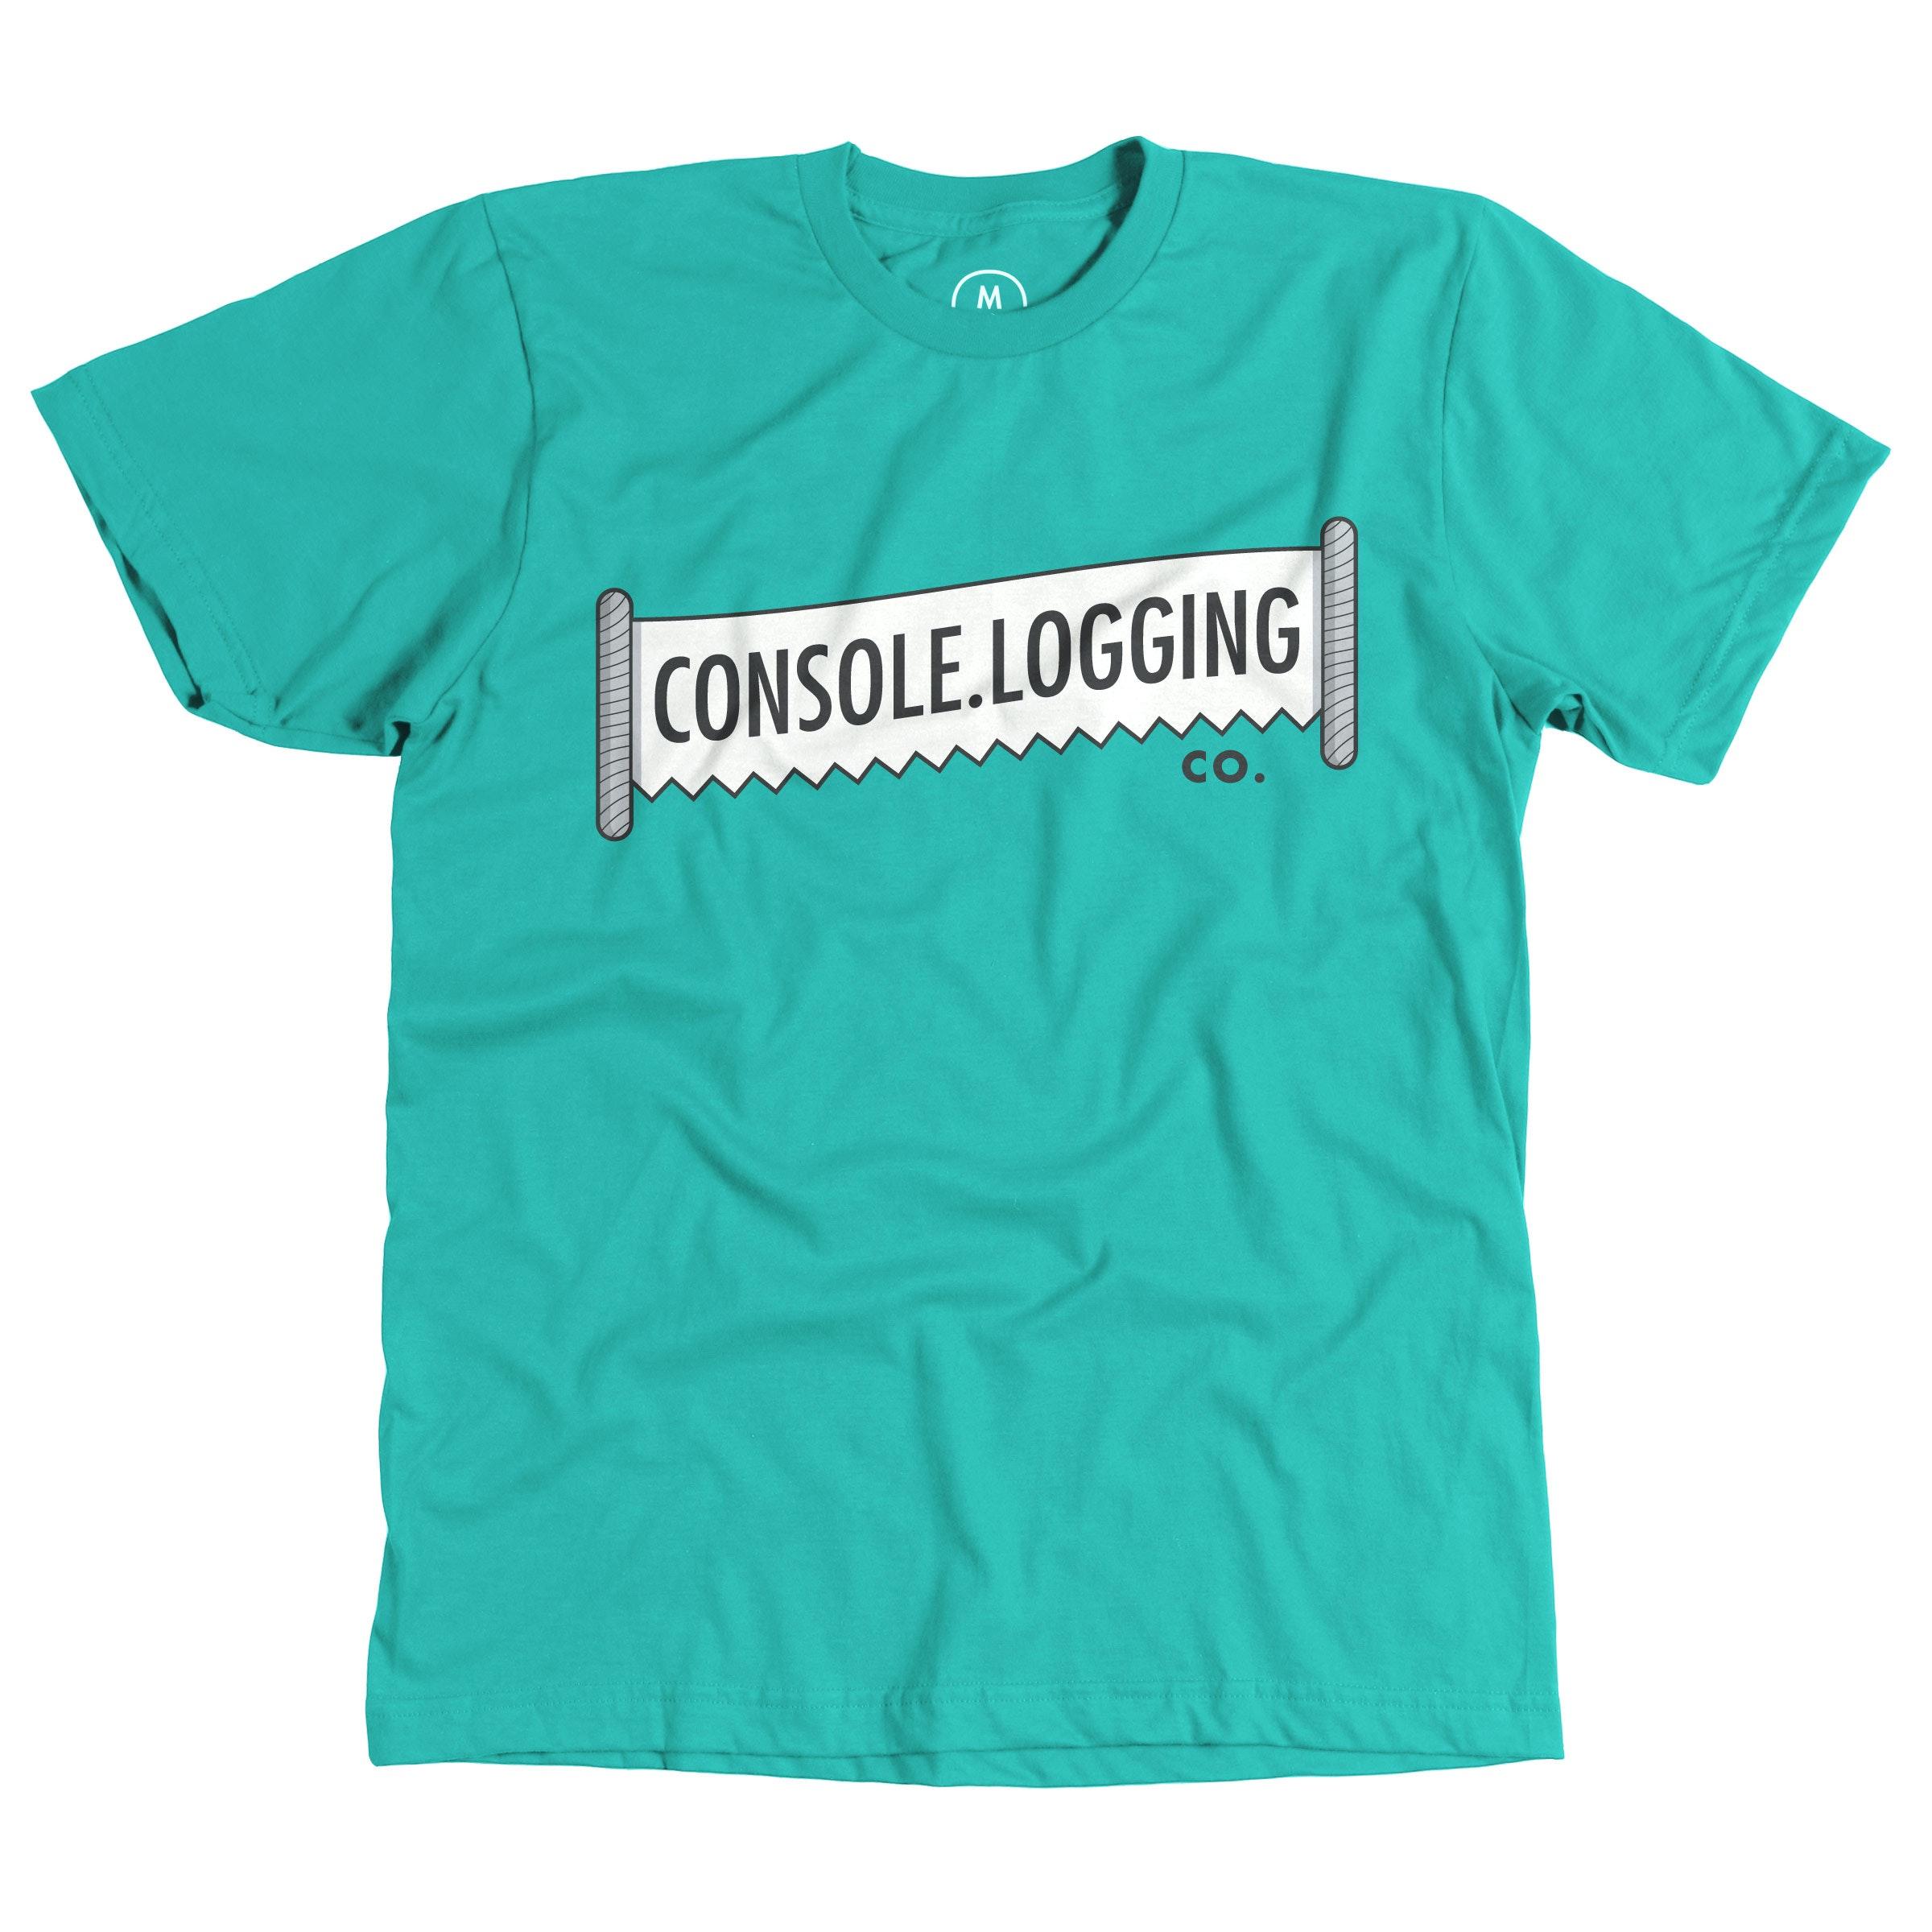 Console.Logging His